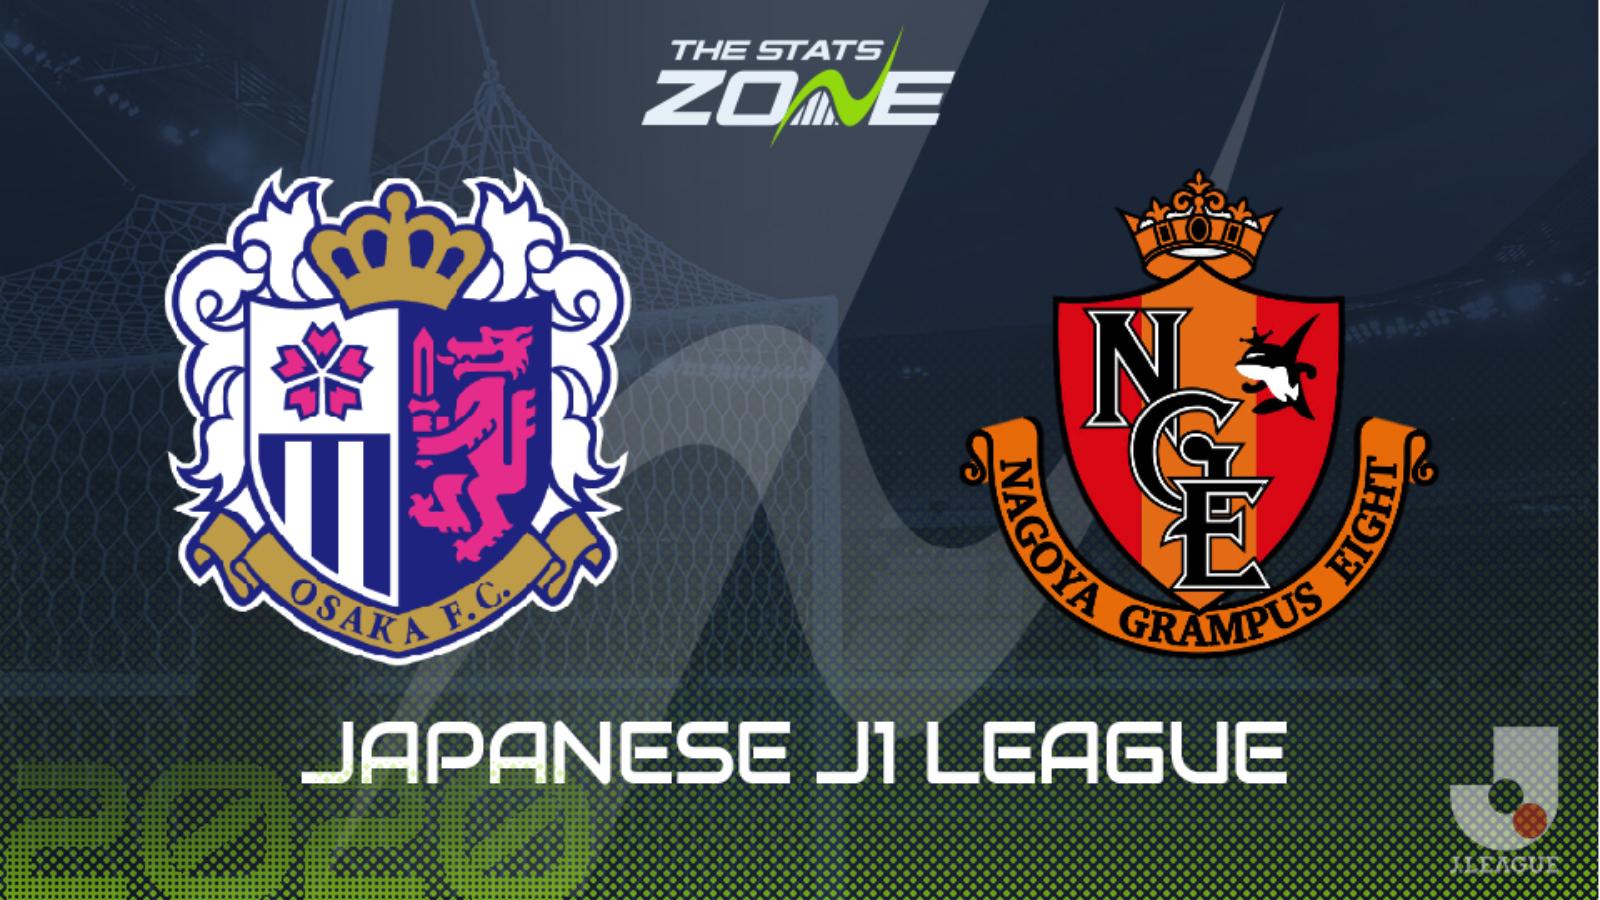 2019 20 Japanese J1 League Cerezo Osaka Vs Nagoya Grampus Preview Prediction The Stats Zone